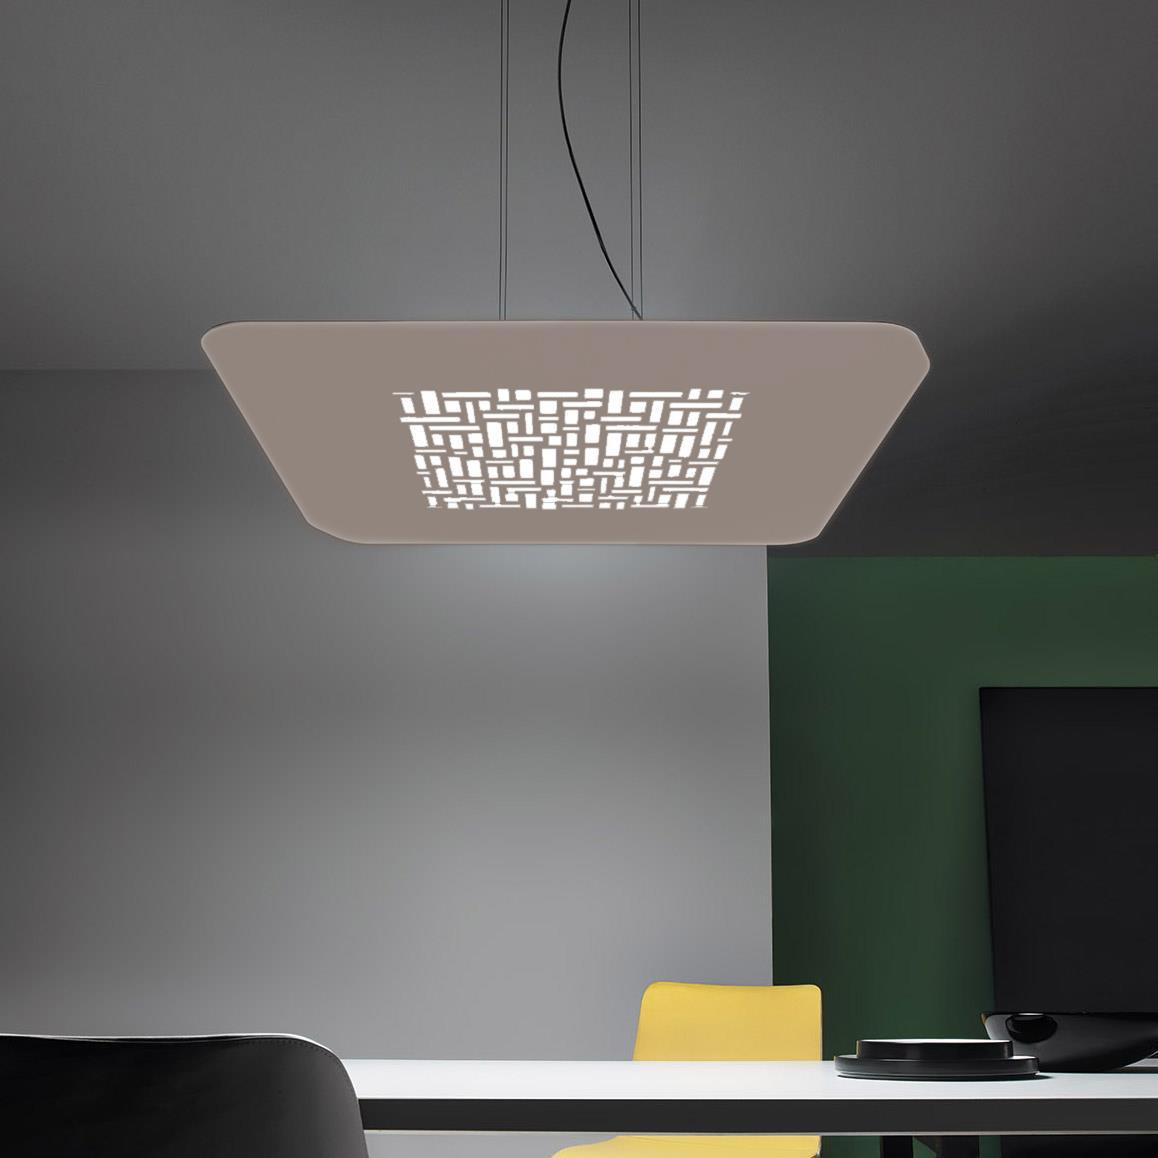 Giarnieri - Illuminazione Sala da Pranzo | Offerte e Sconti Online